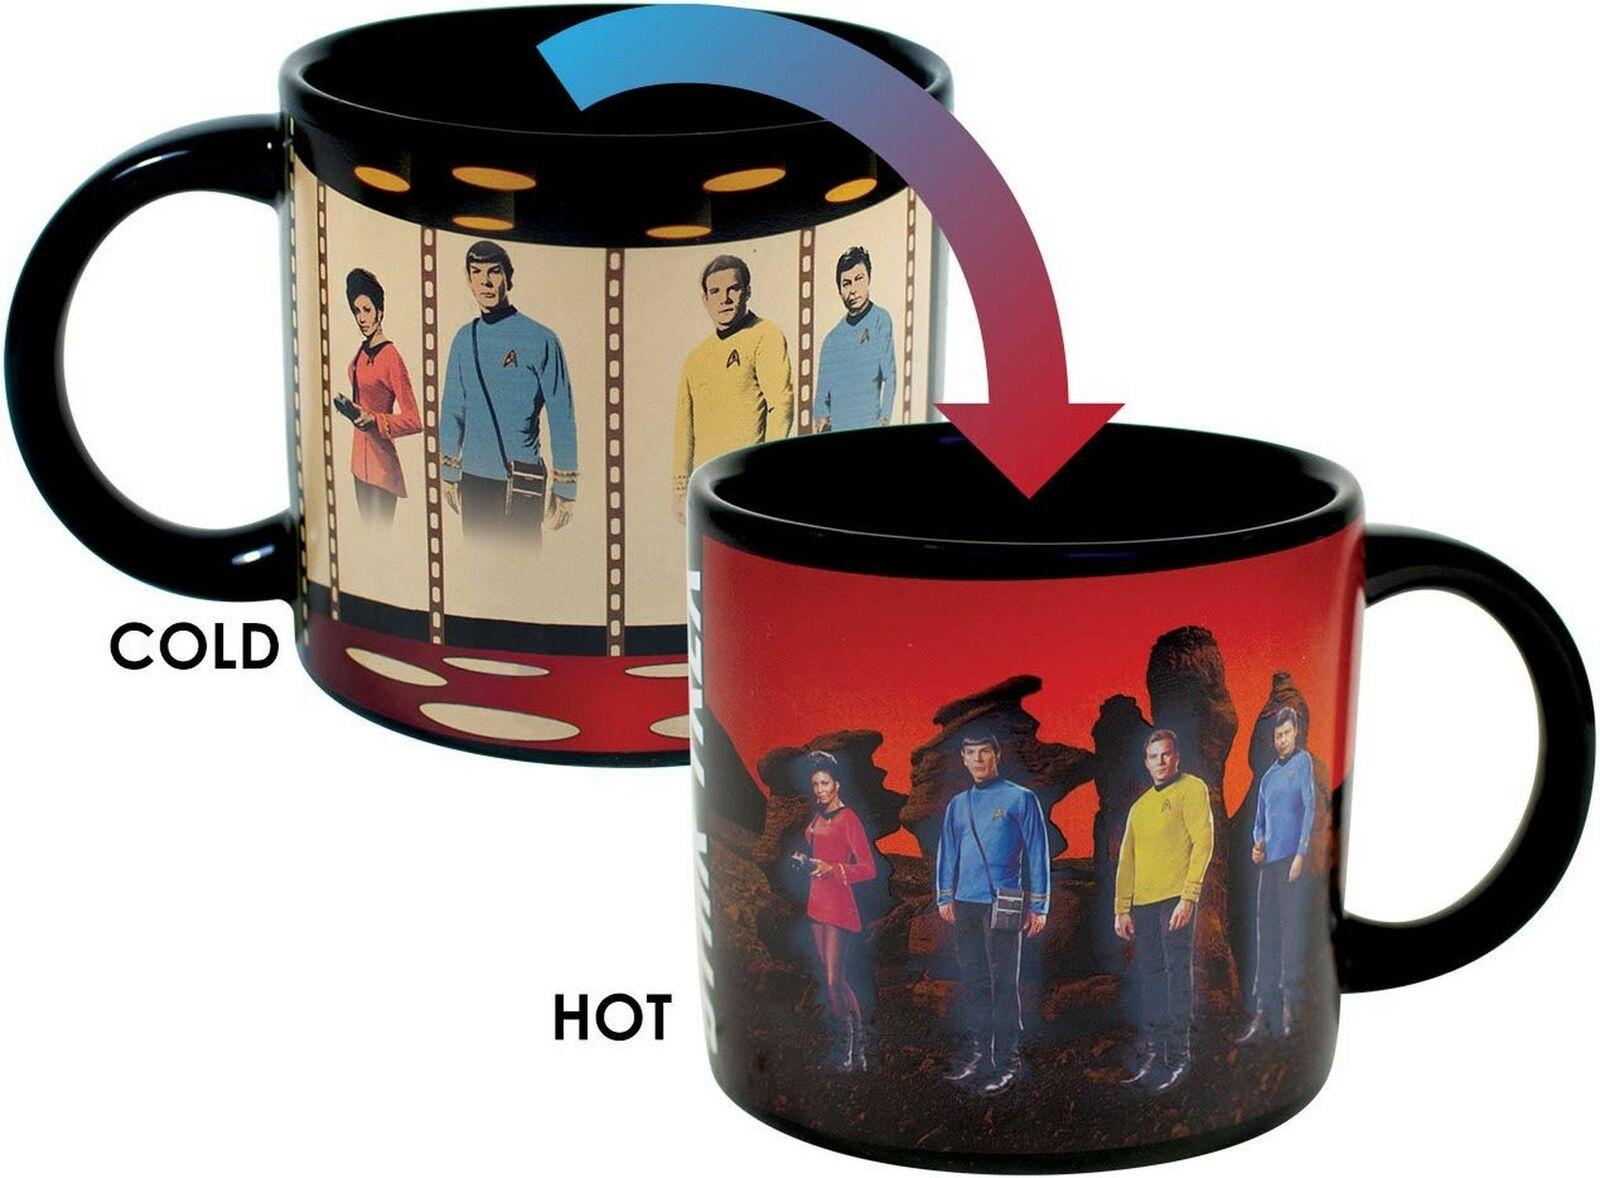 Star trek mug hot cold 1